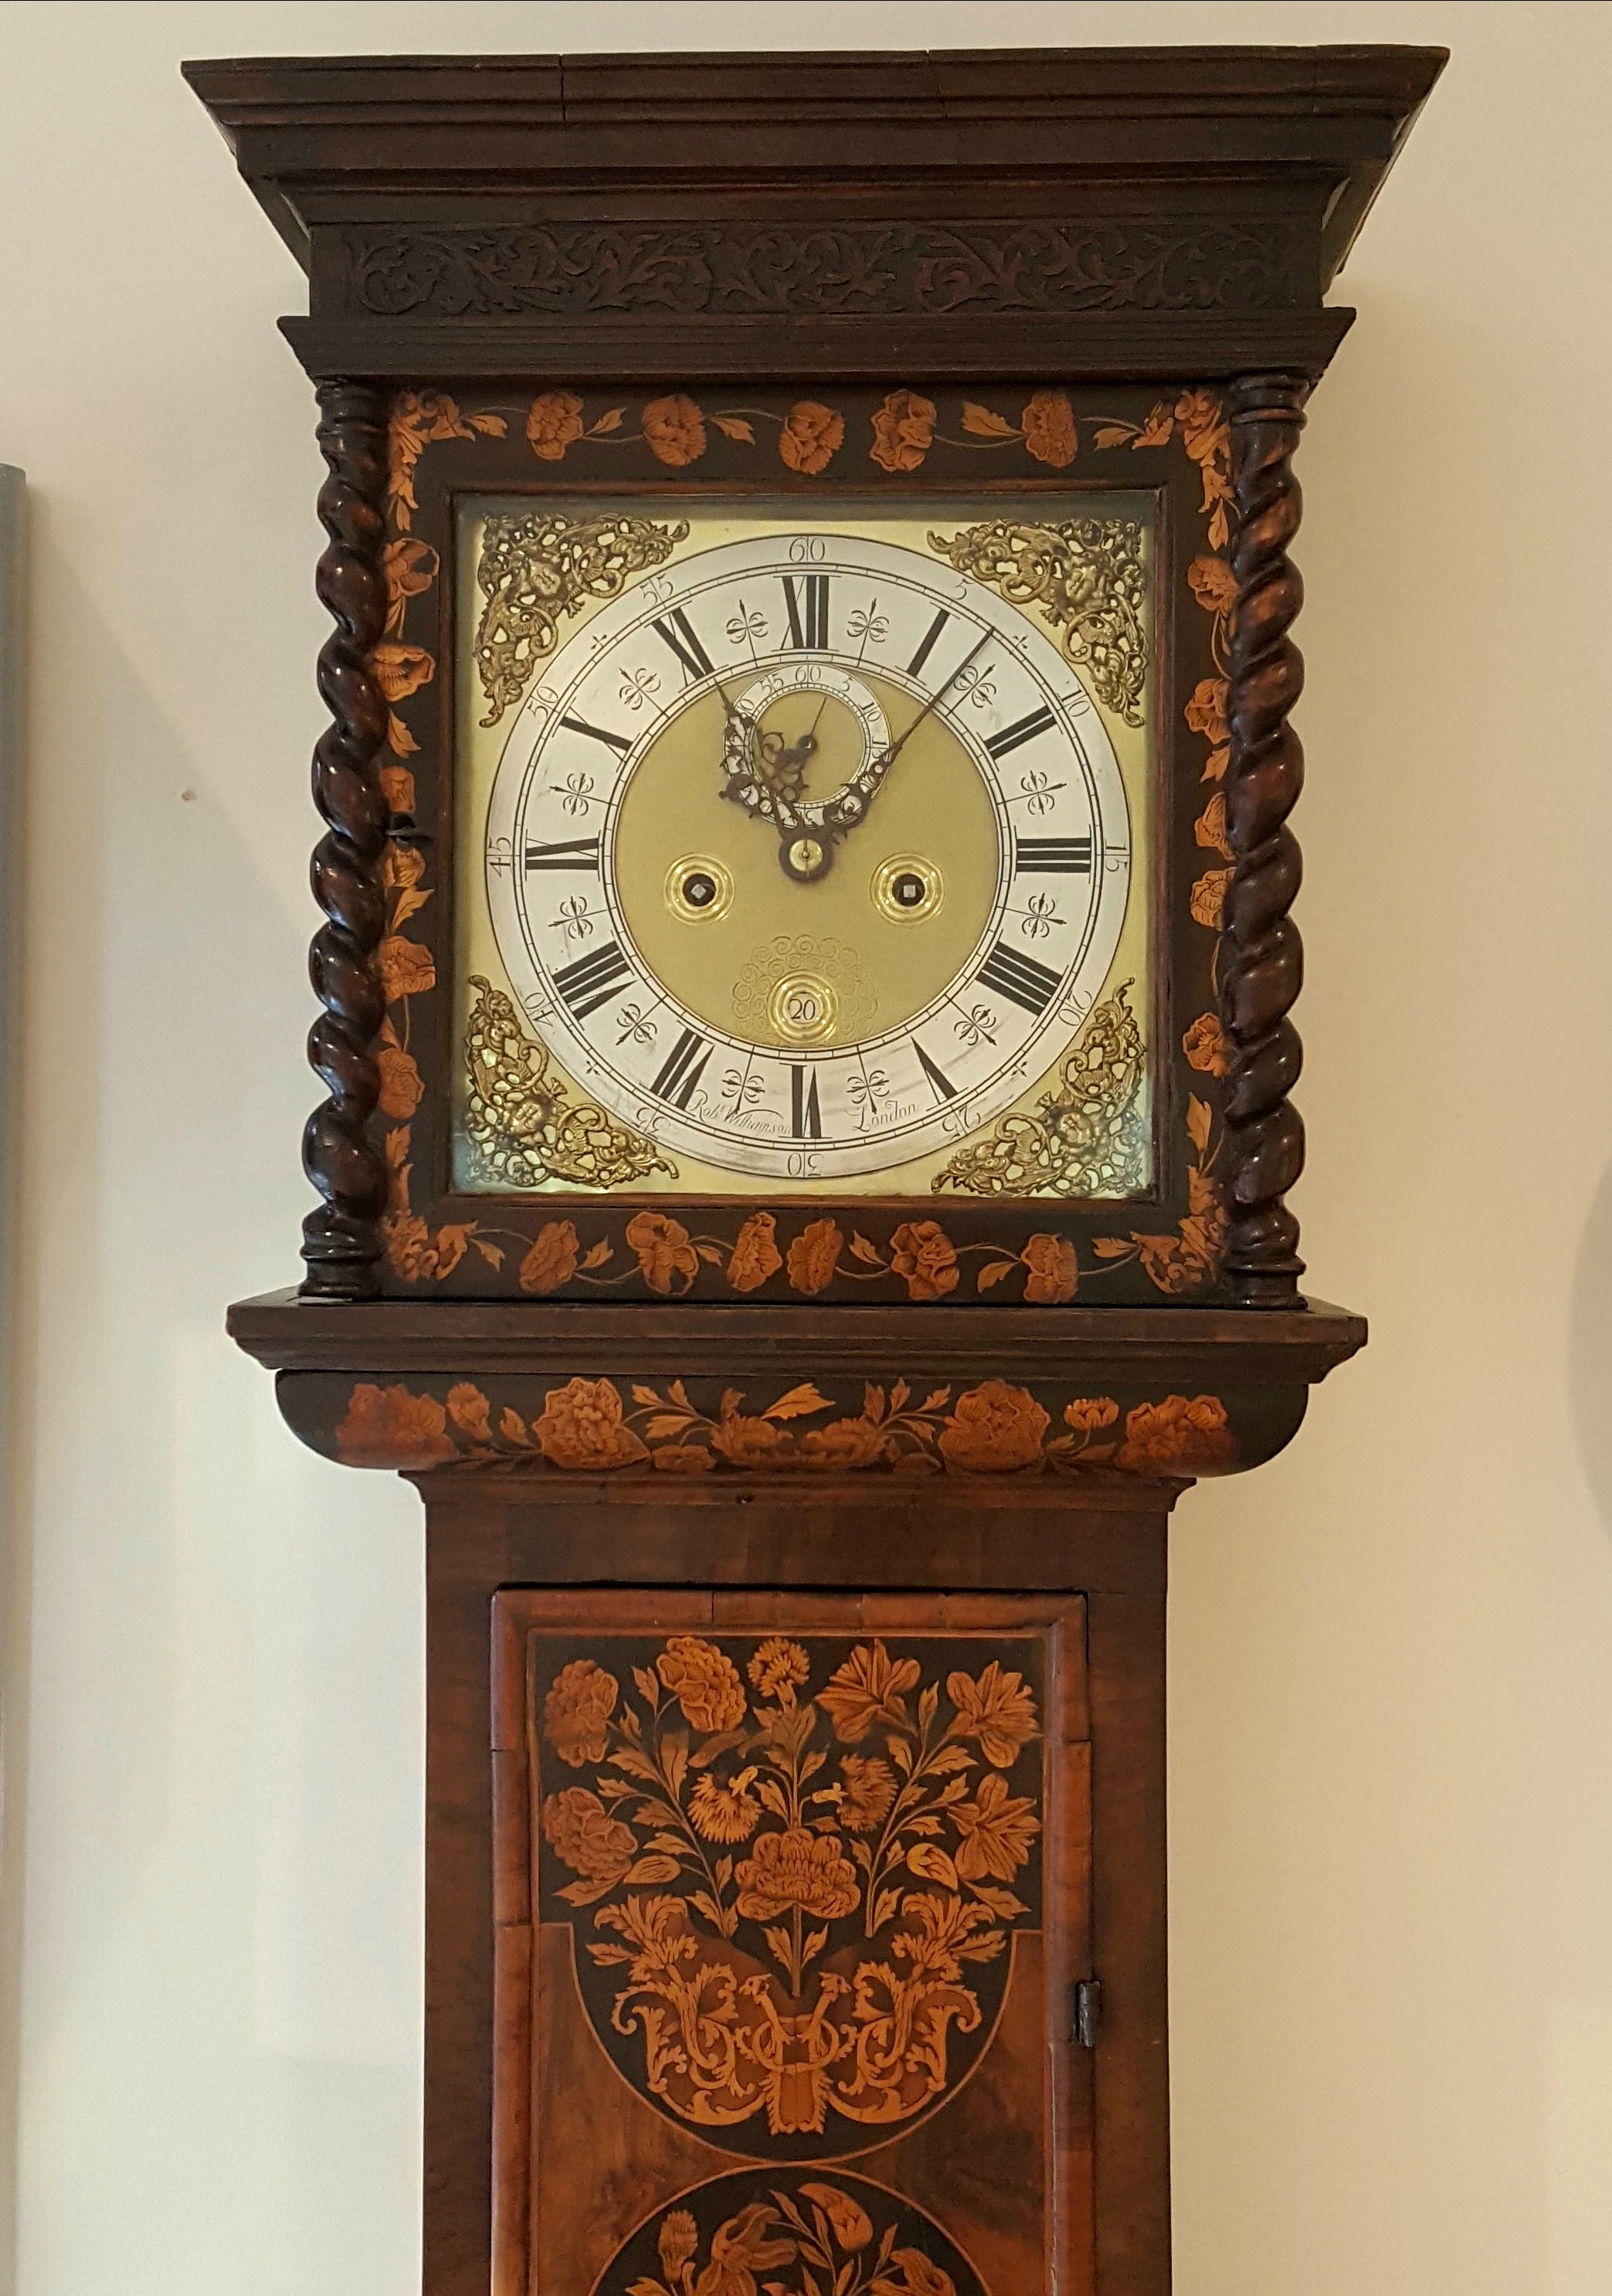 William & Mary Long Case Clock